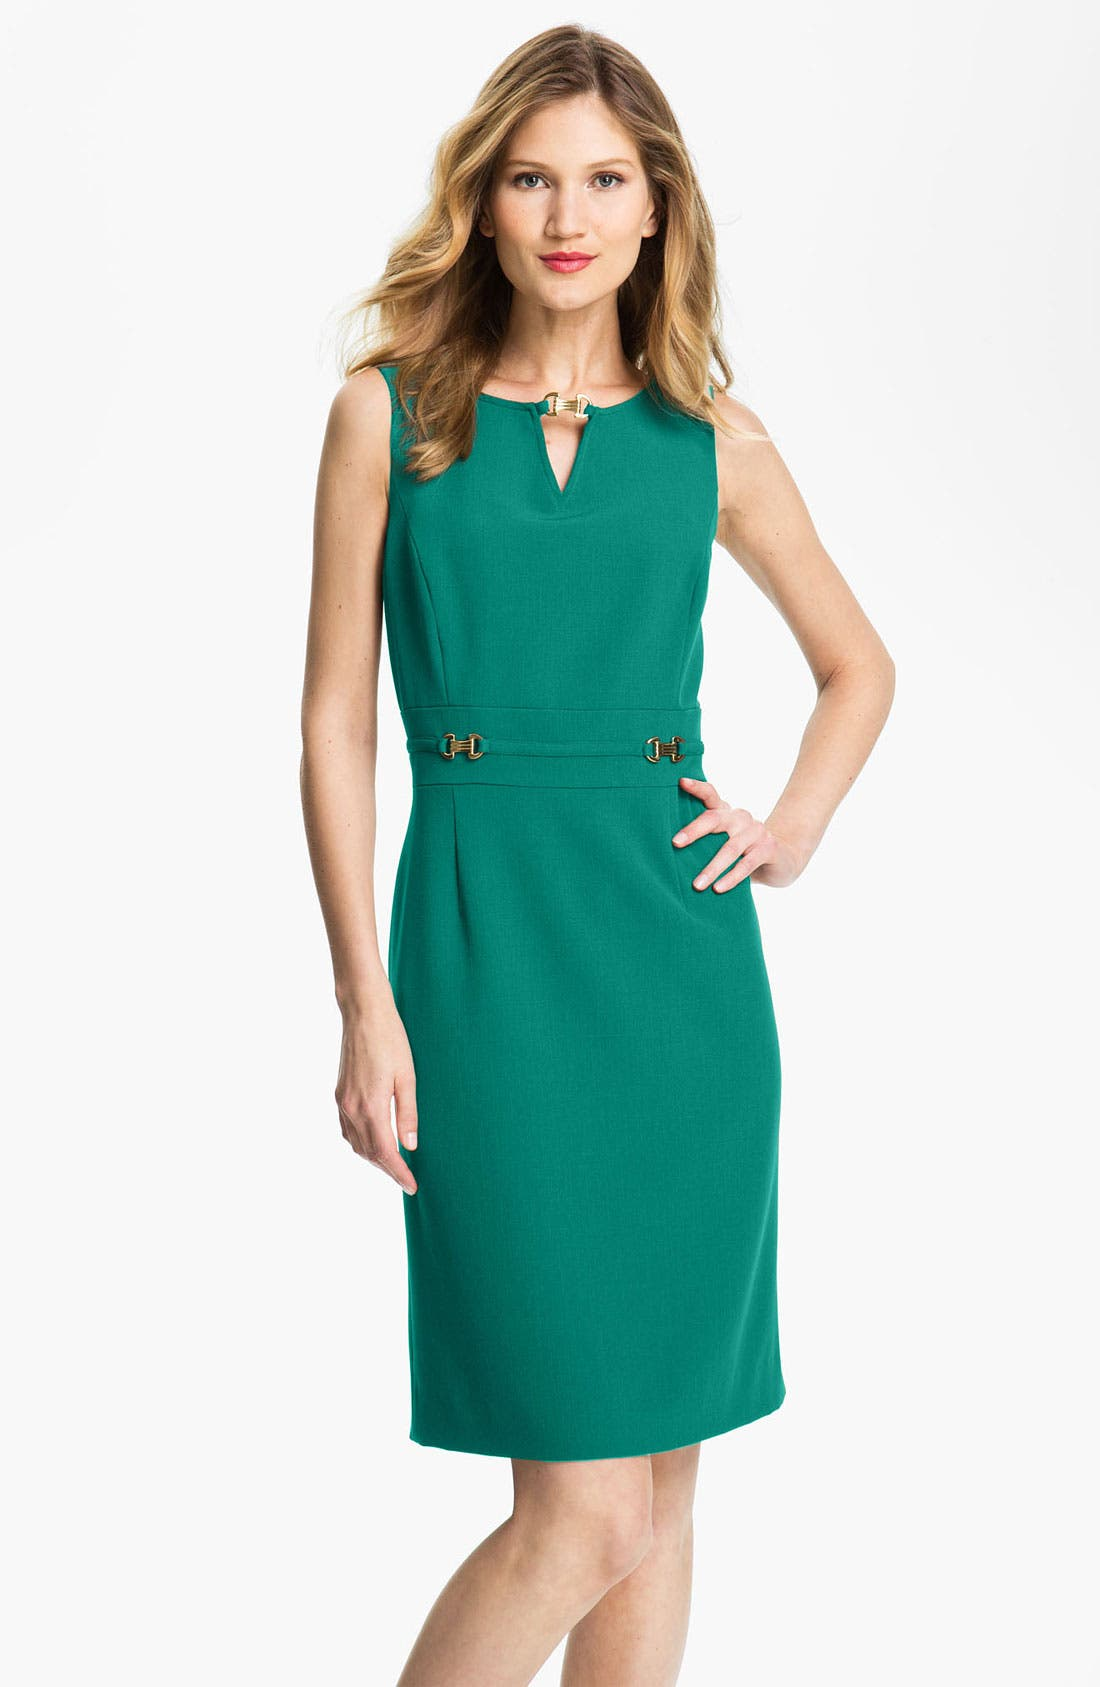 Alternate Image 1 Selected - Tahari Sleeveless Shift Dress